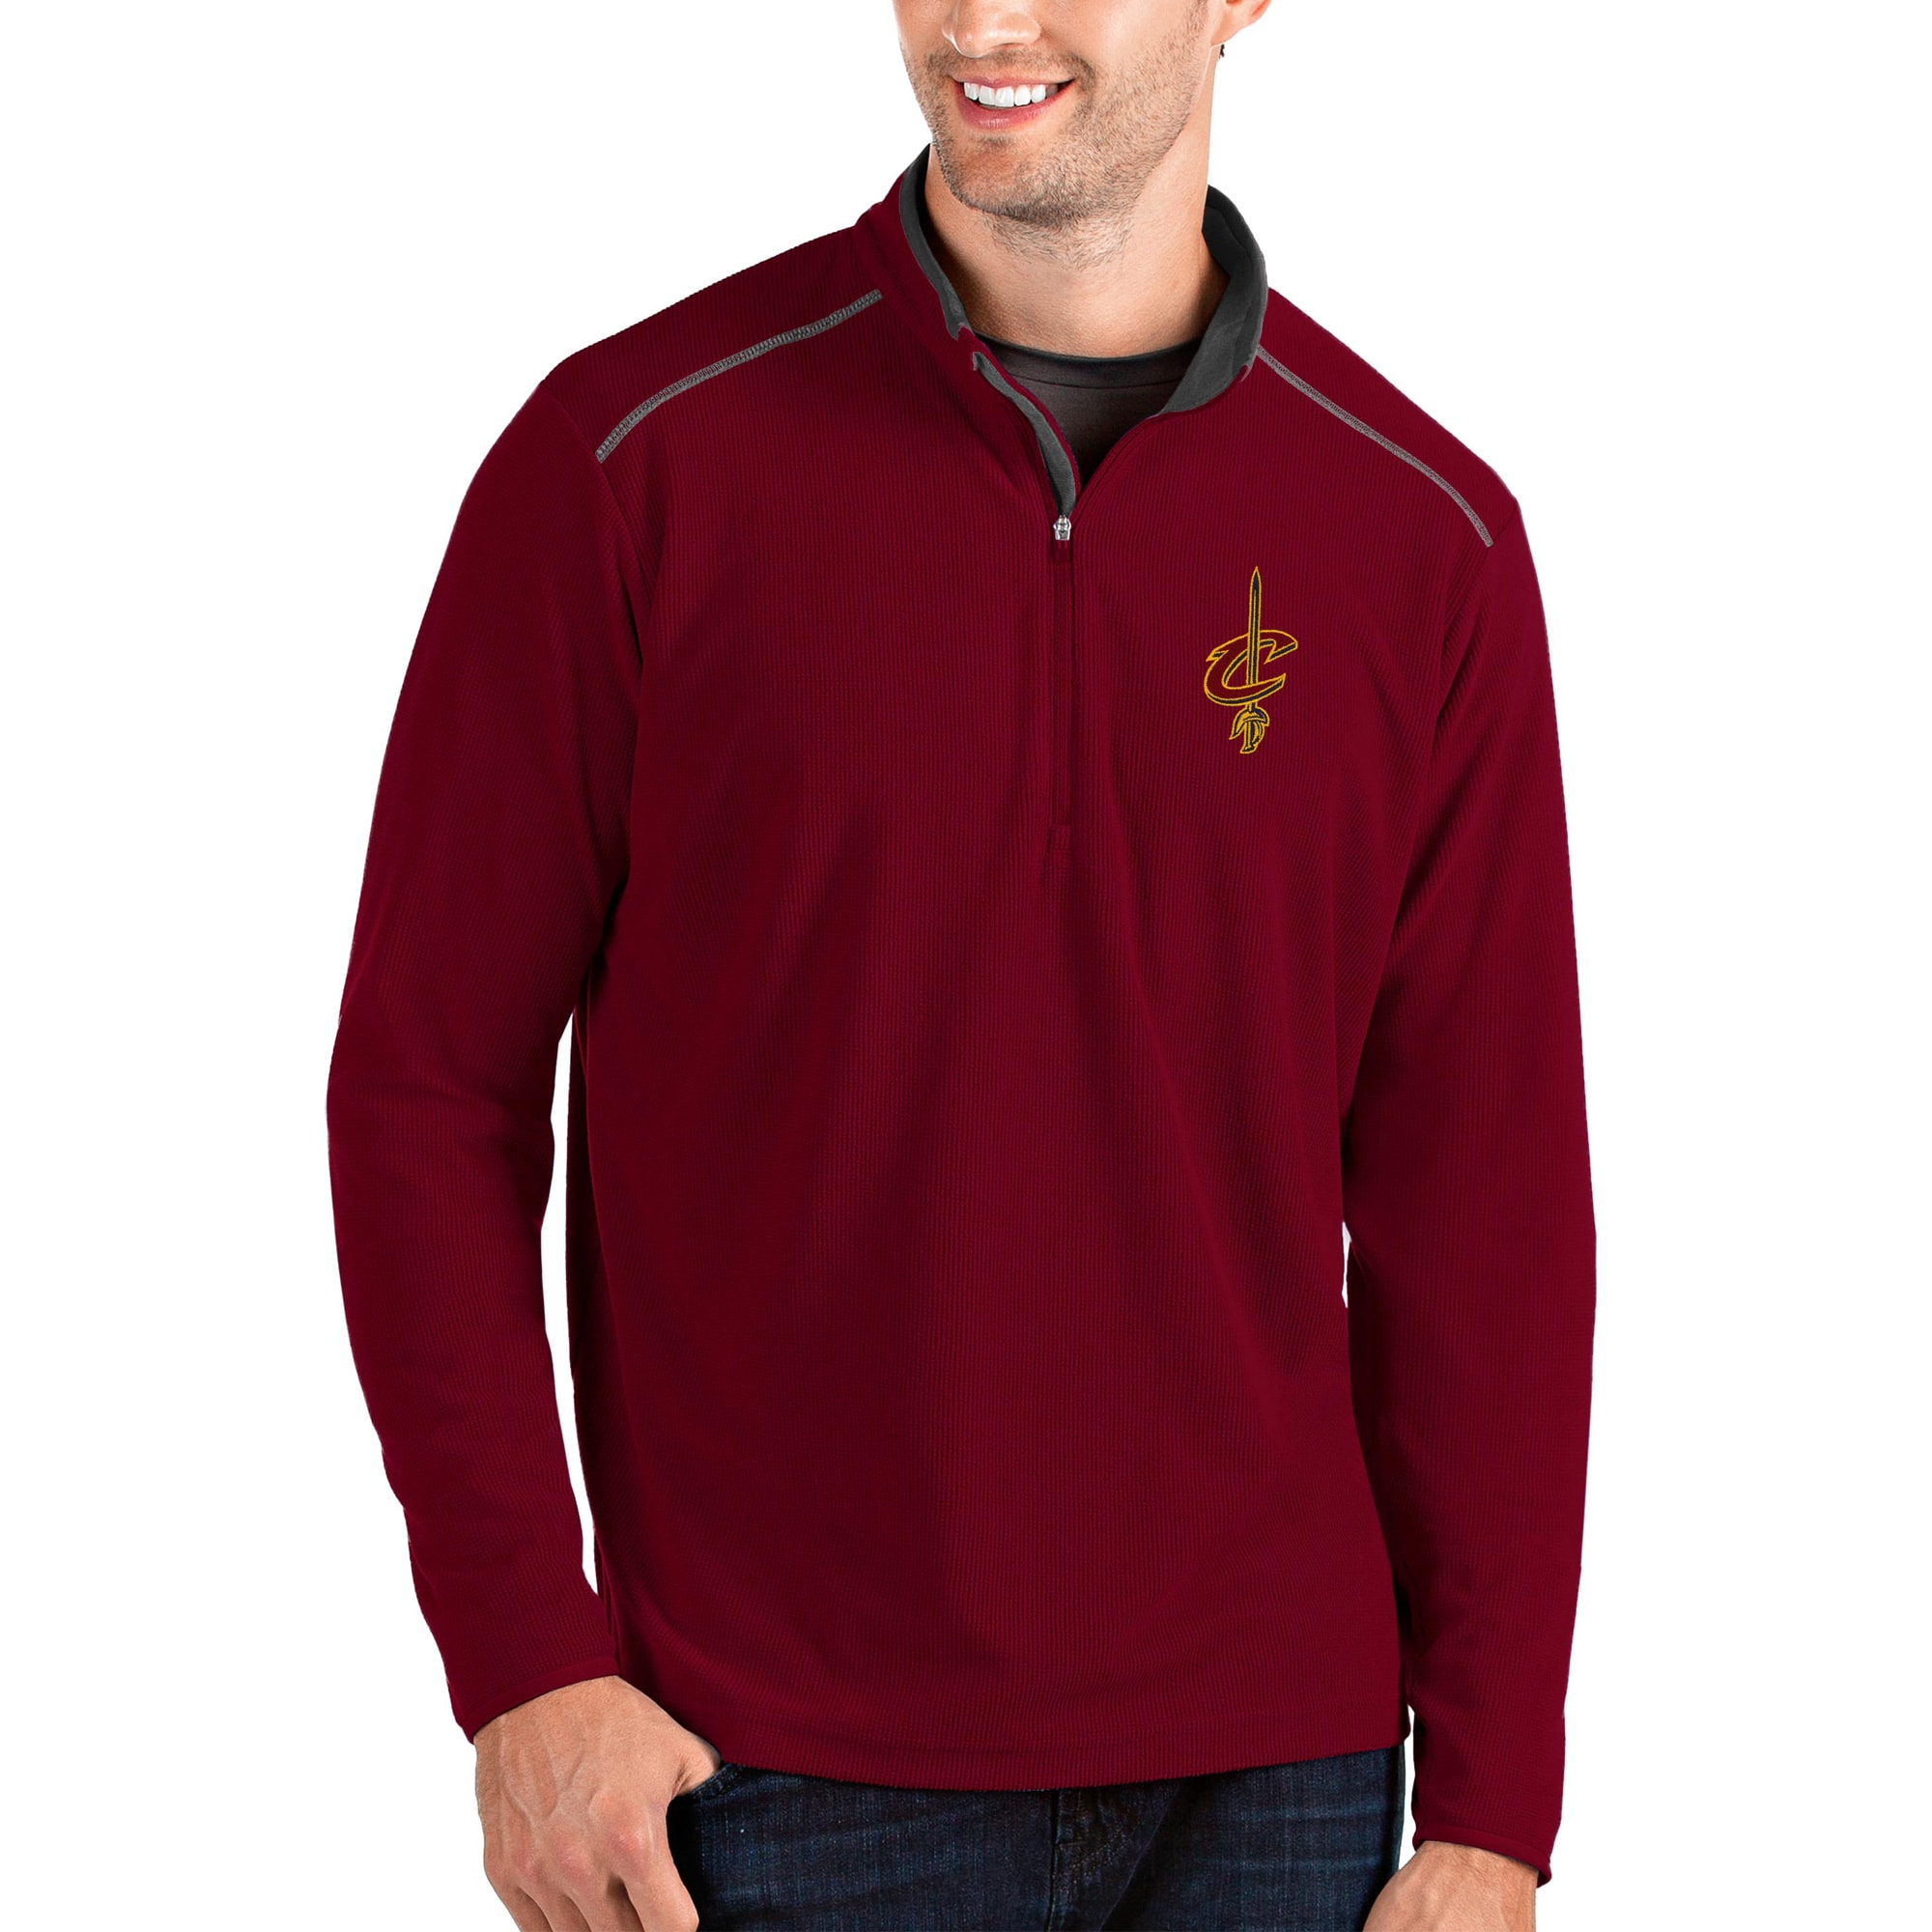 Cleveland Cavaliers Antigua Glacier Quarter-Zip Pullover Jacket - Wine/Gray